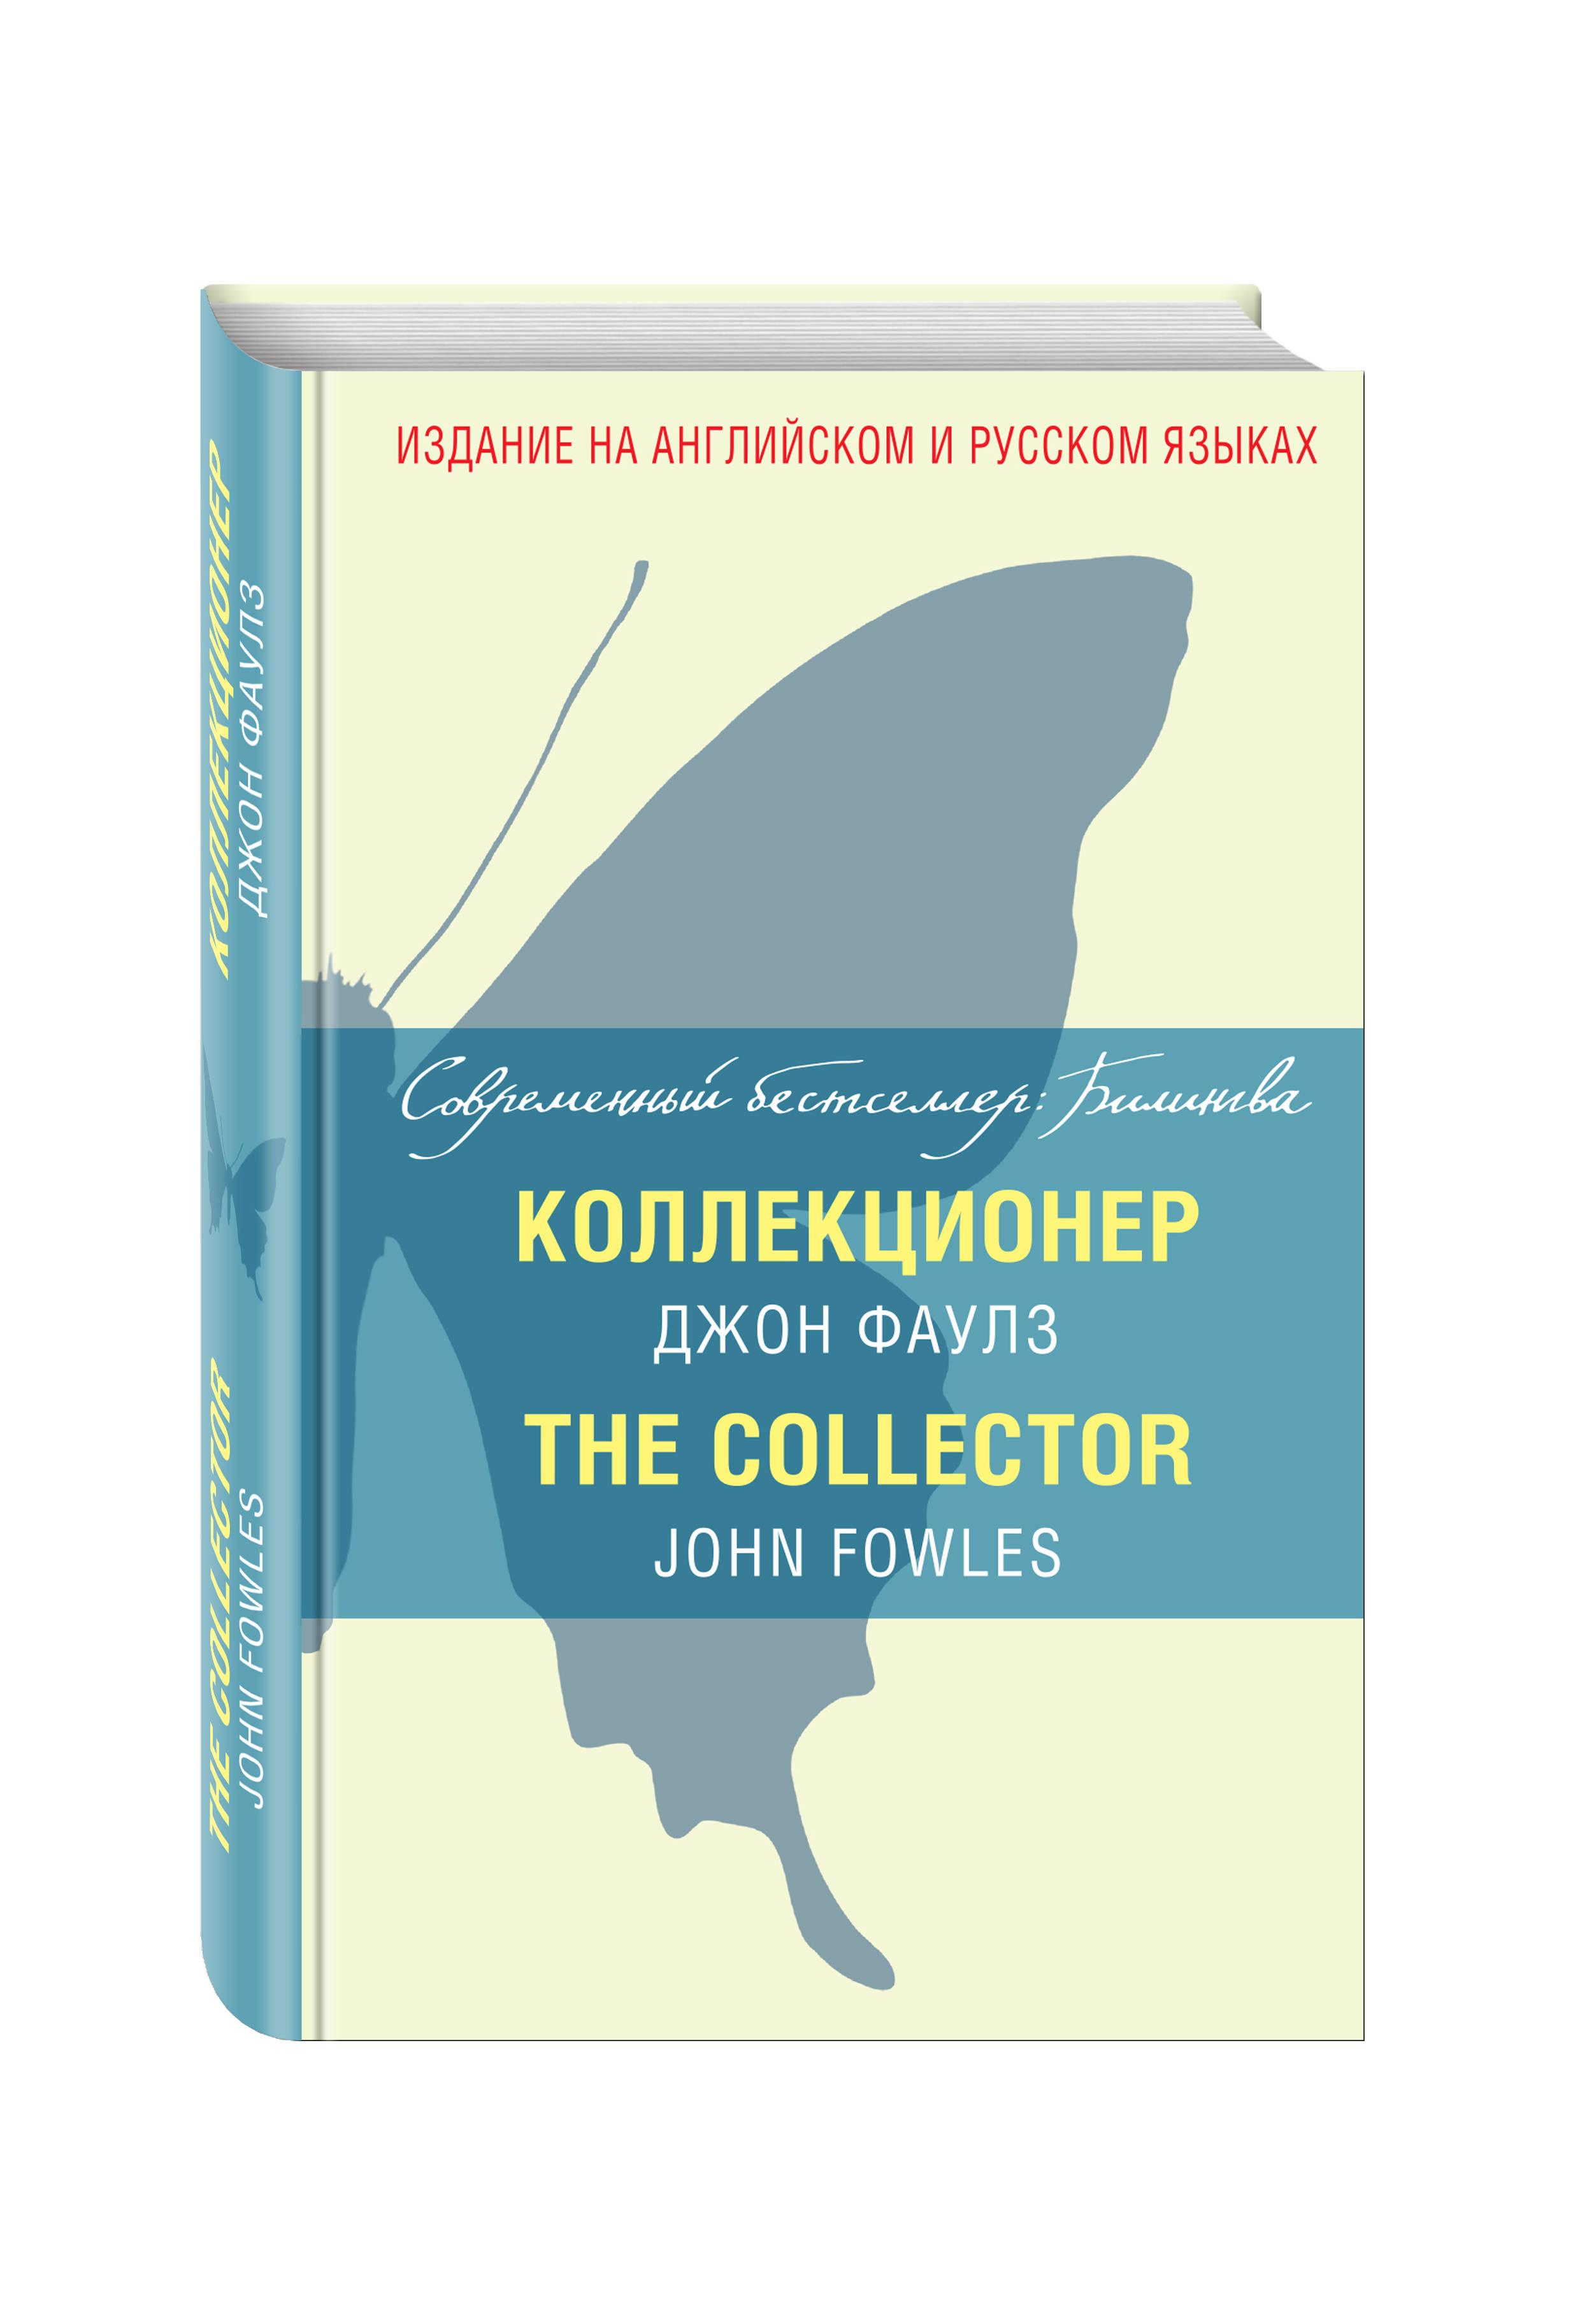 Коллекционер = The Collector